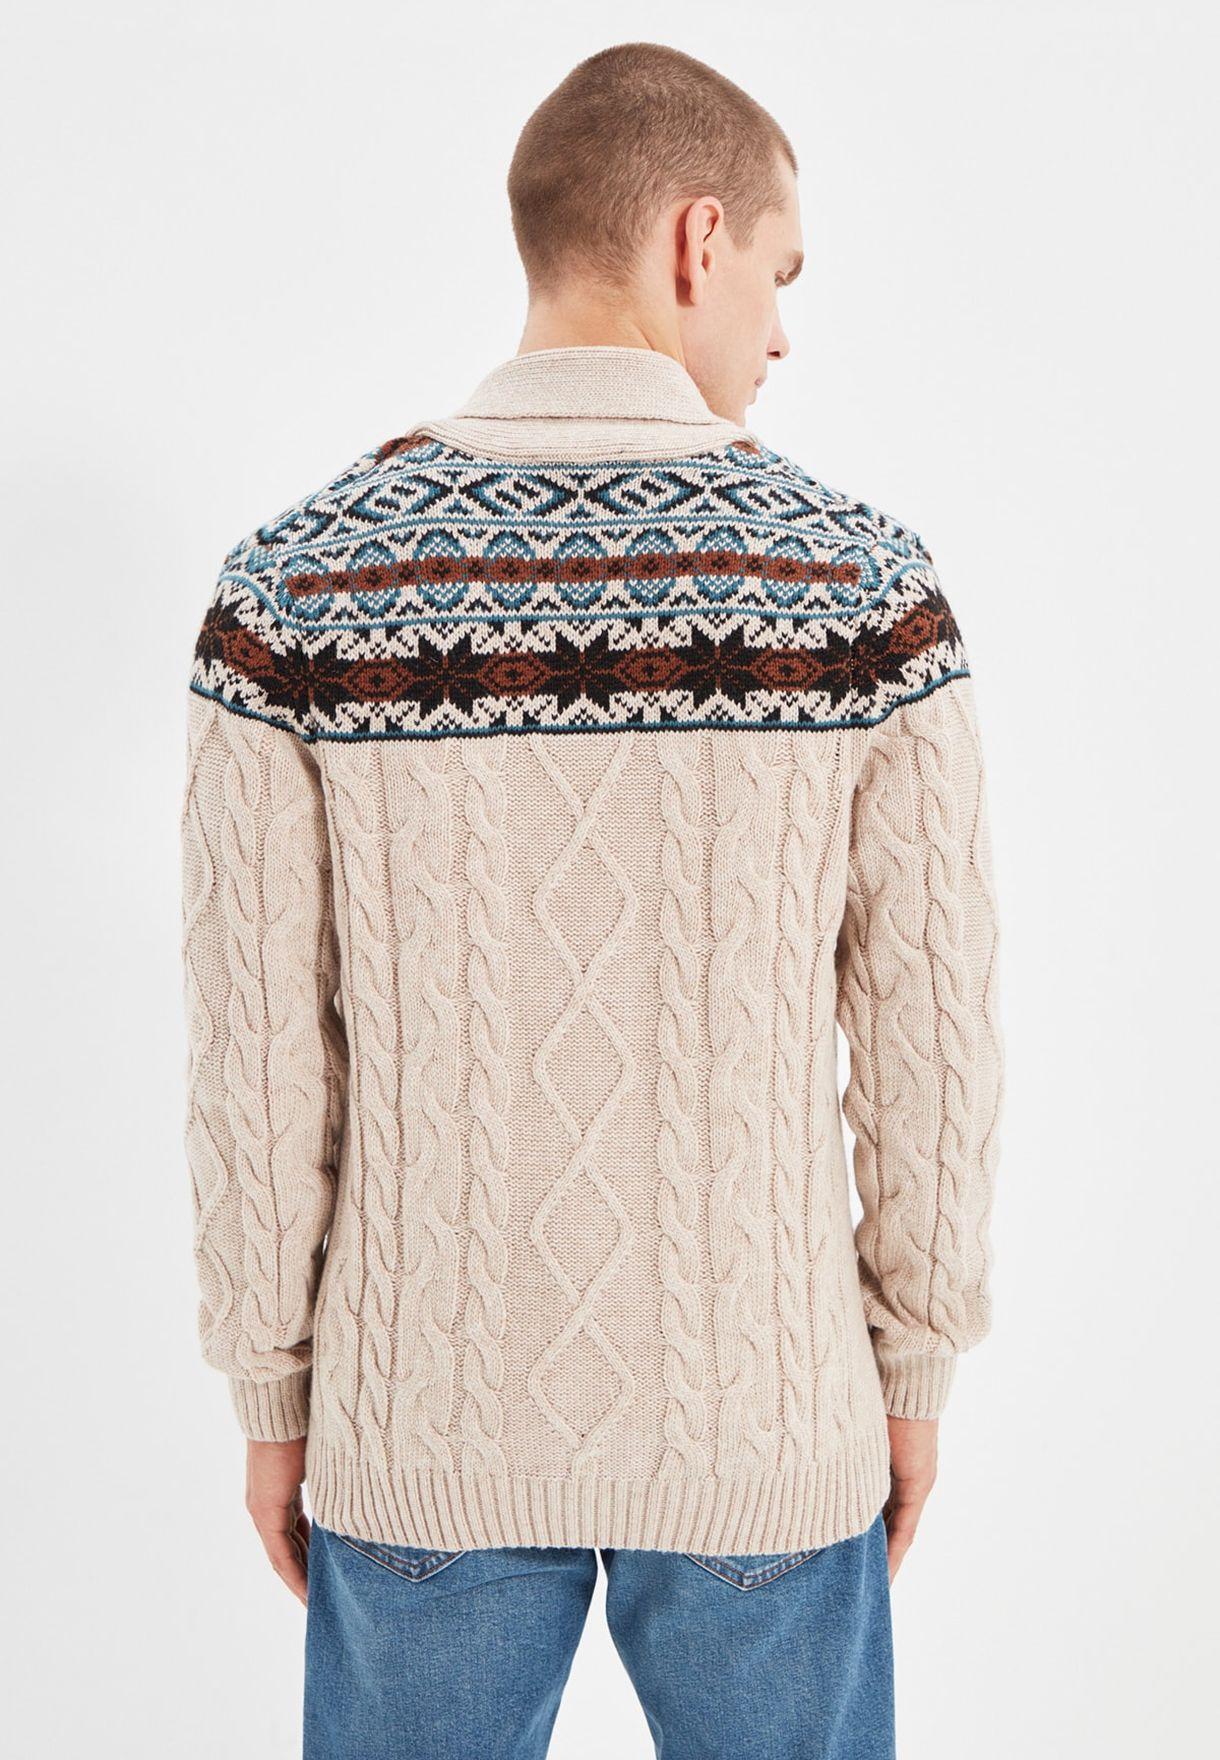 Jacquard Cable Knit Cardigan